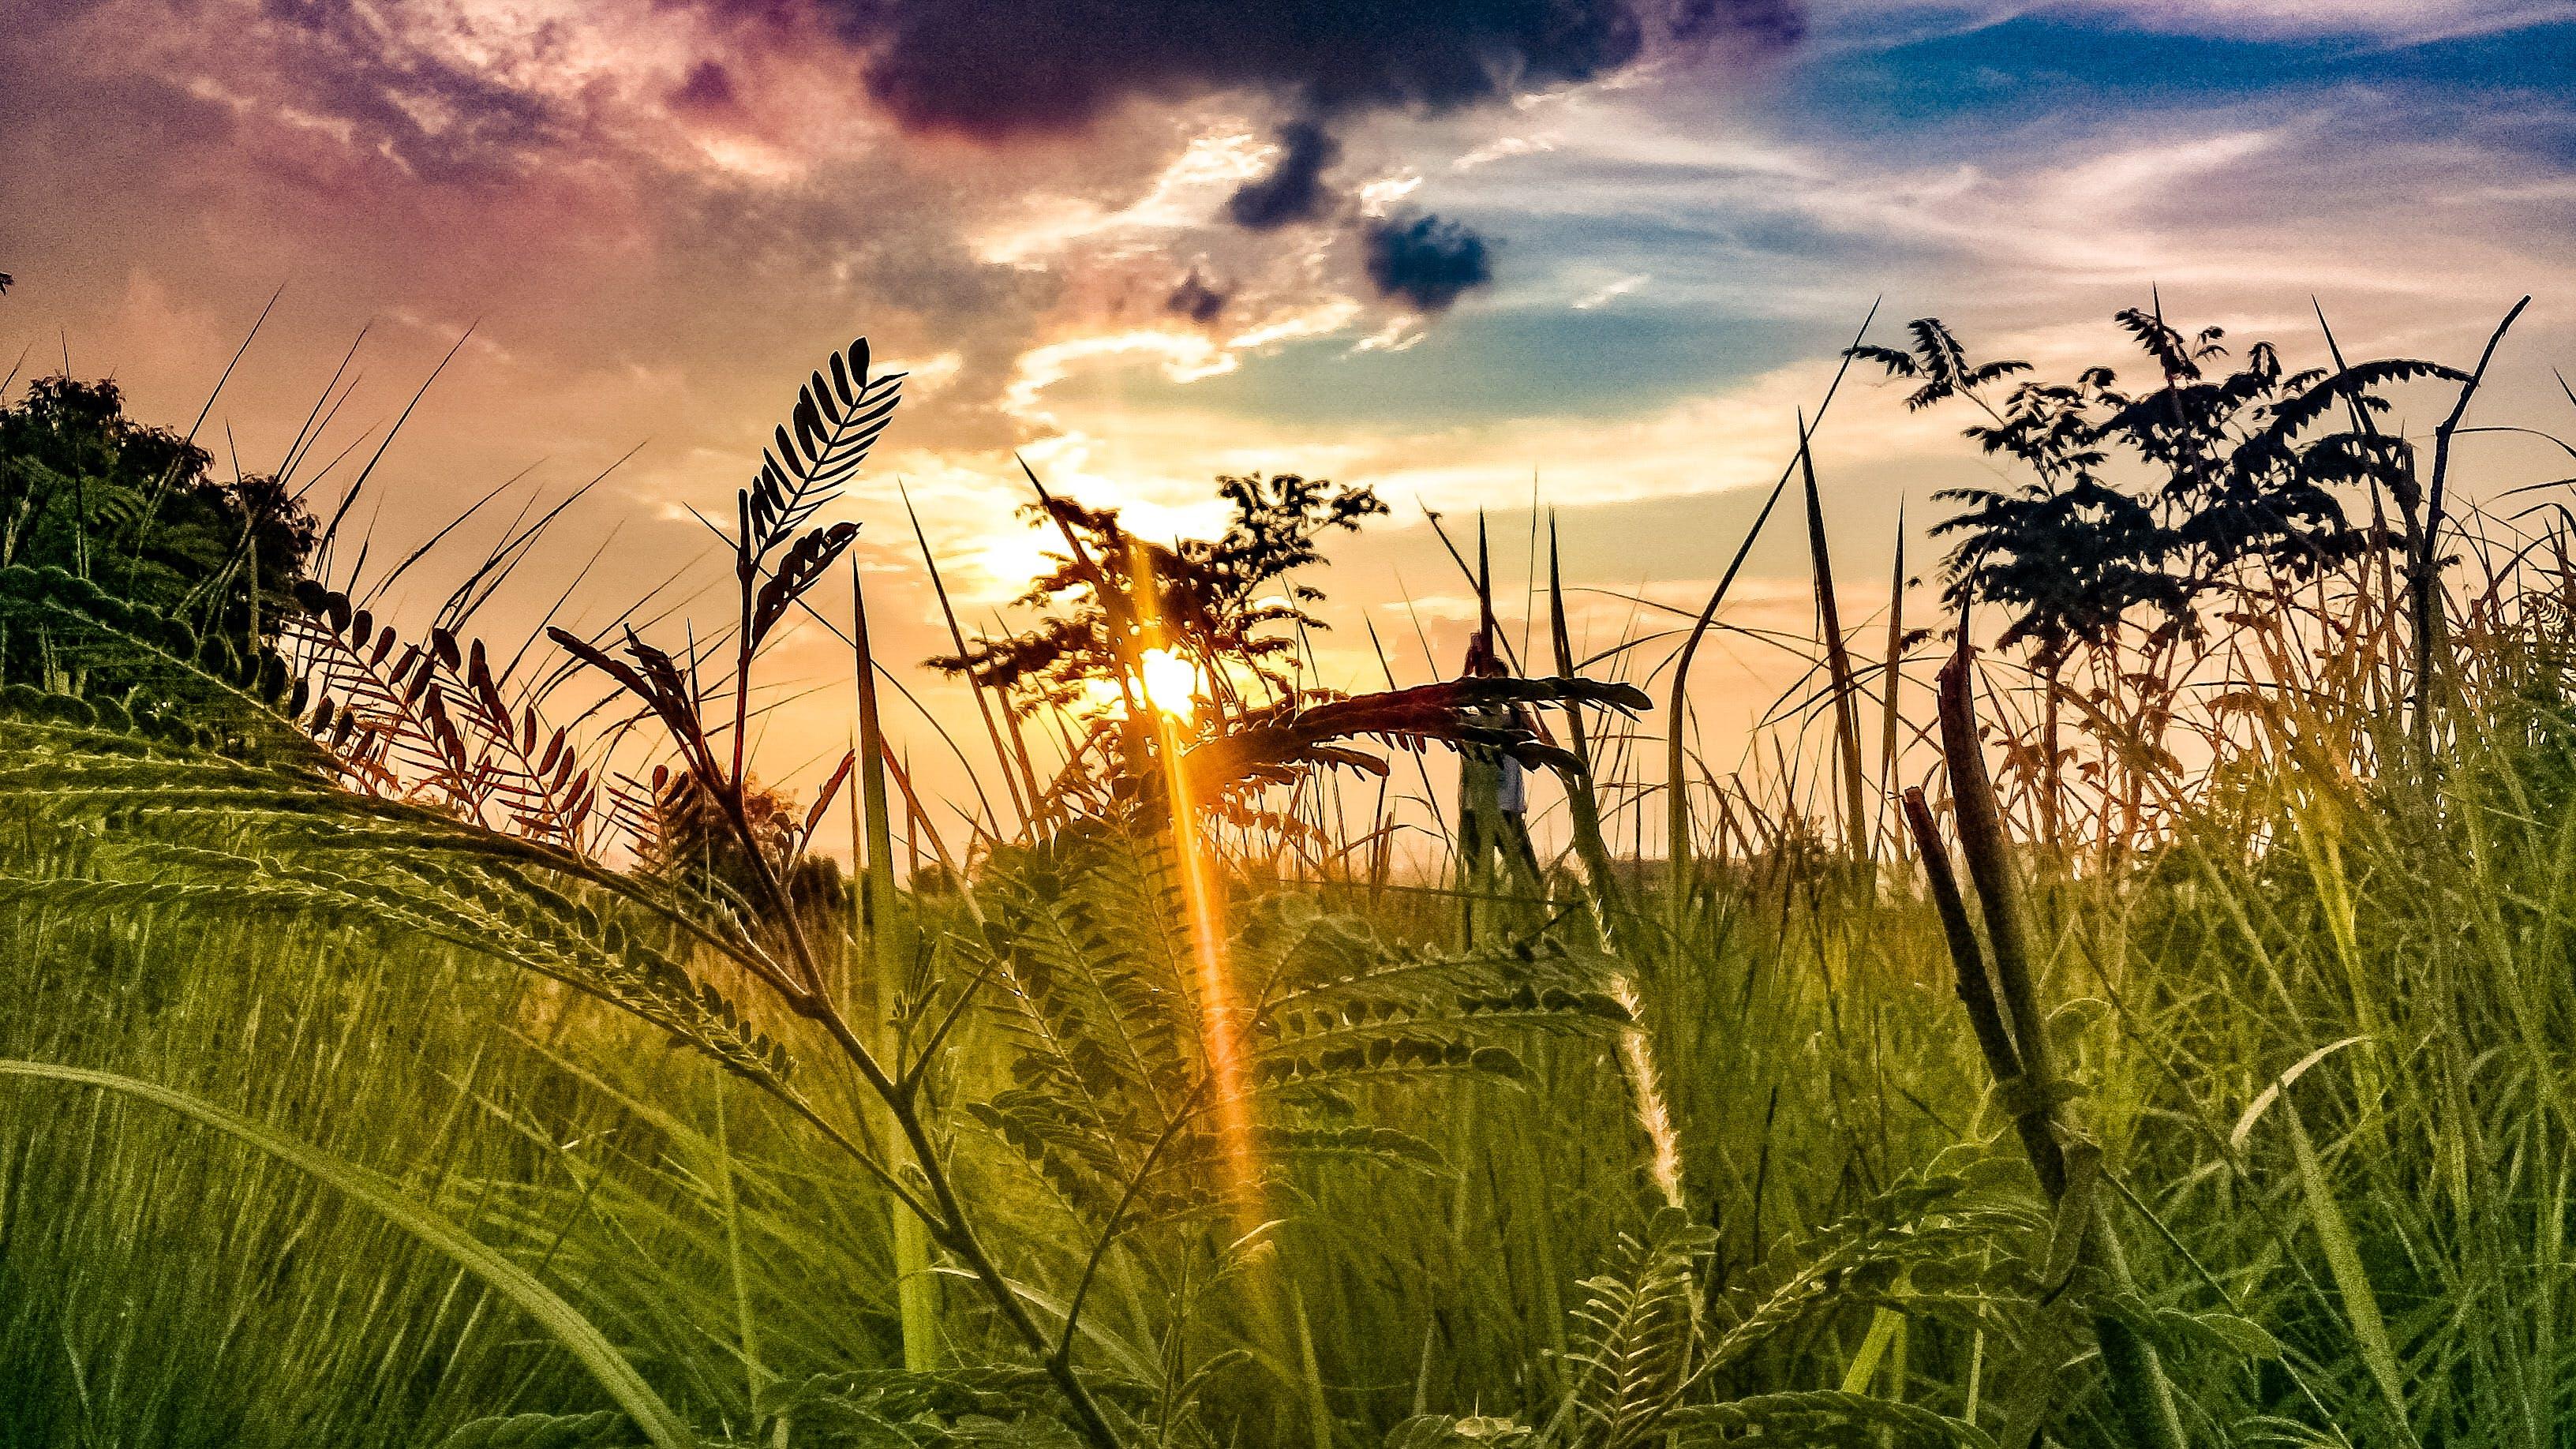 Free stock photo of nature, sunset, lifestyle, beauty